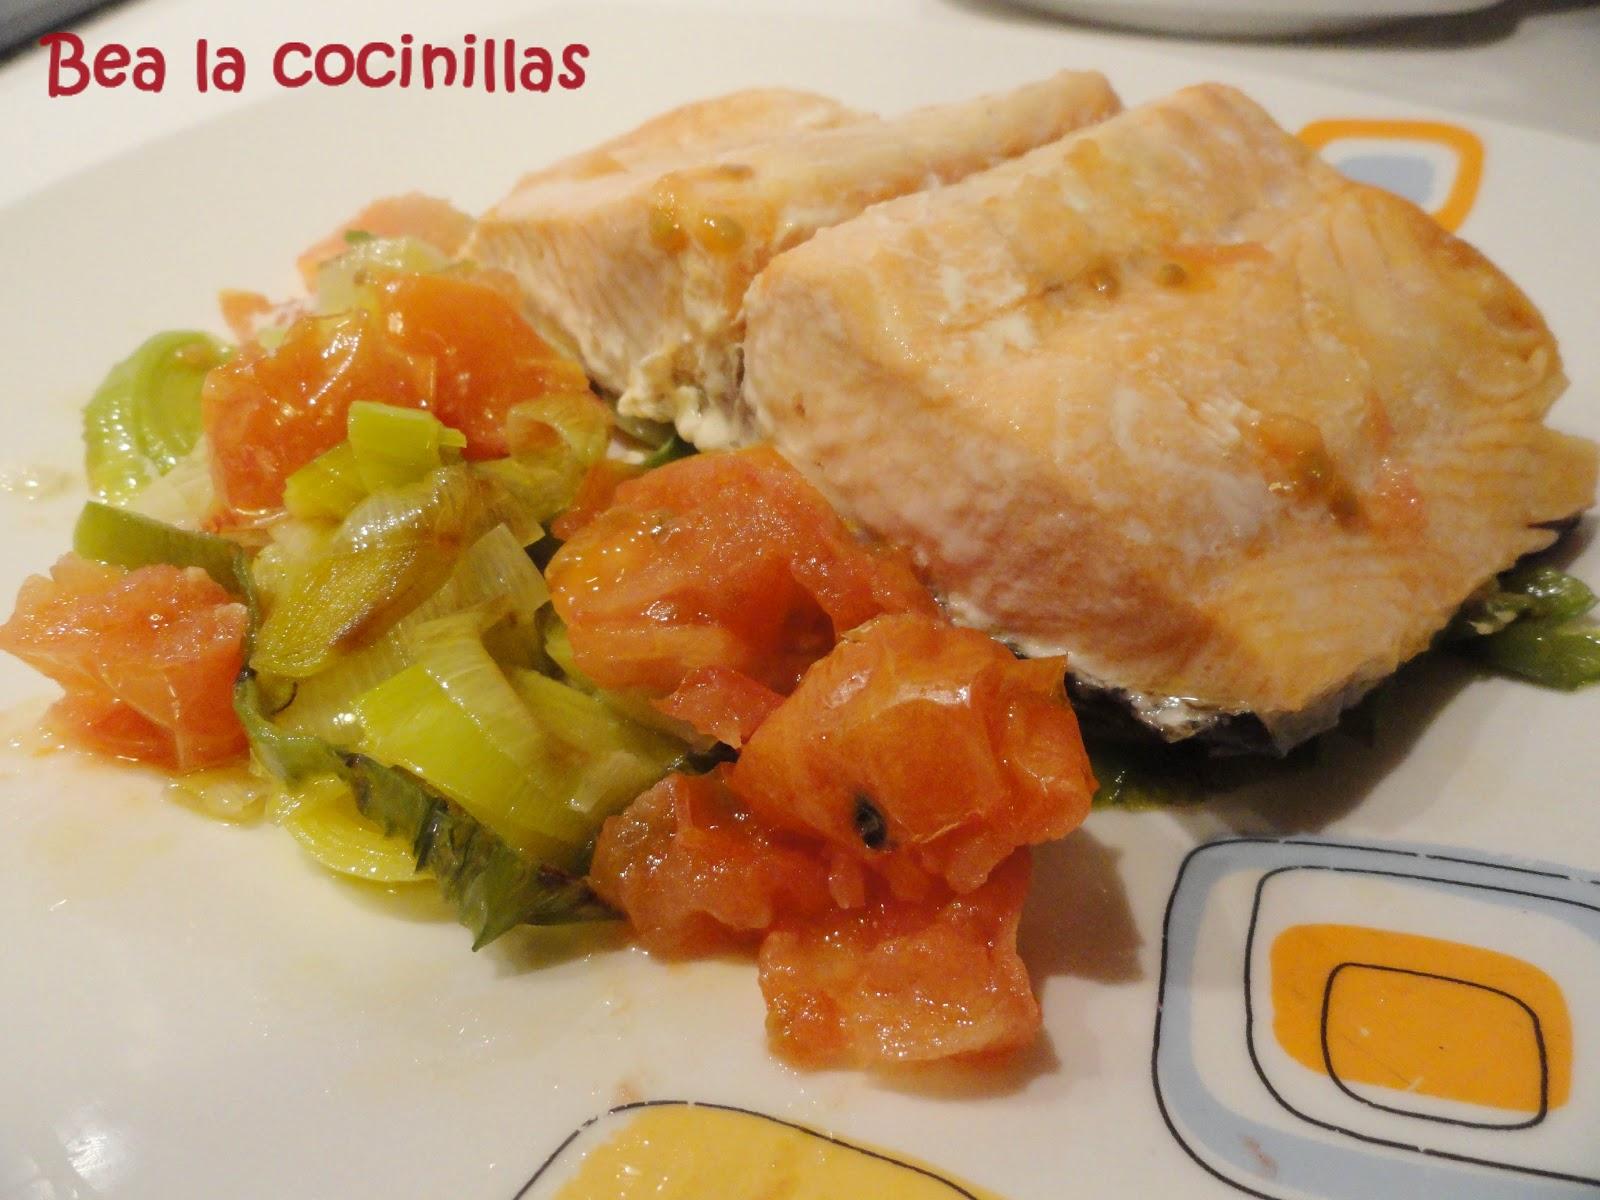 Verduras Microondas Recetas Con Verduras al Microondas